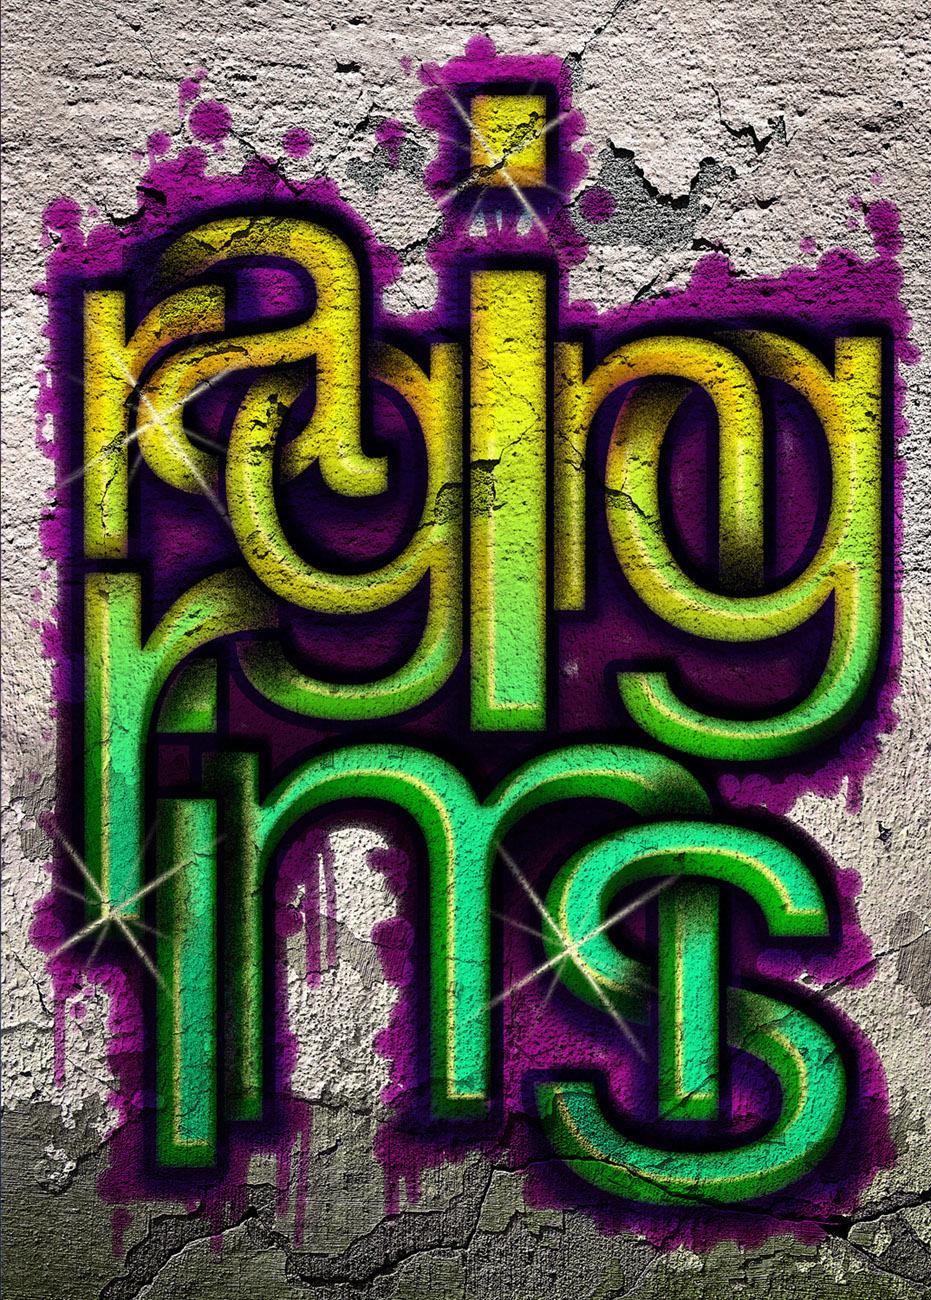 13 Raging Rims.jpg